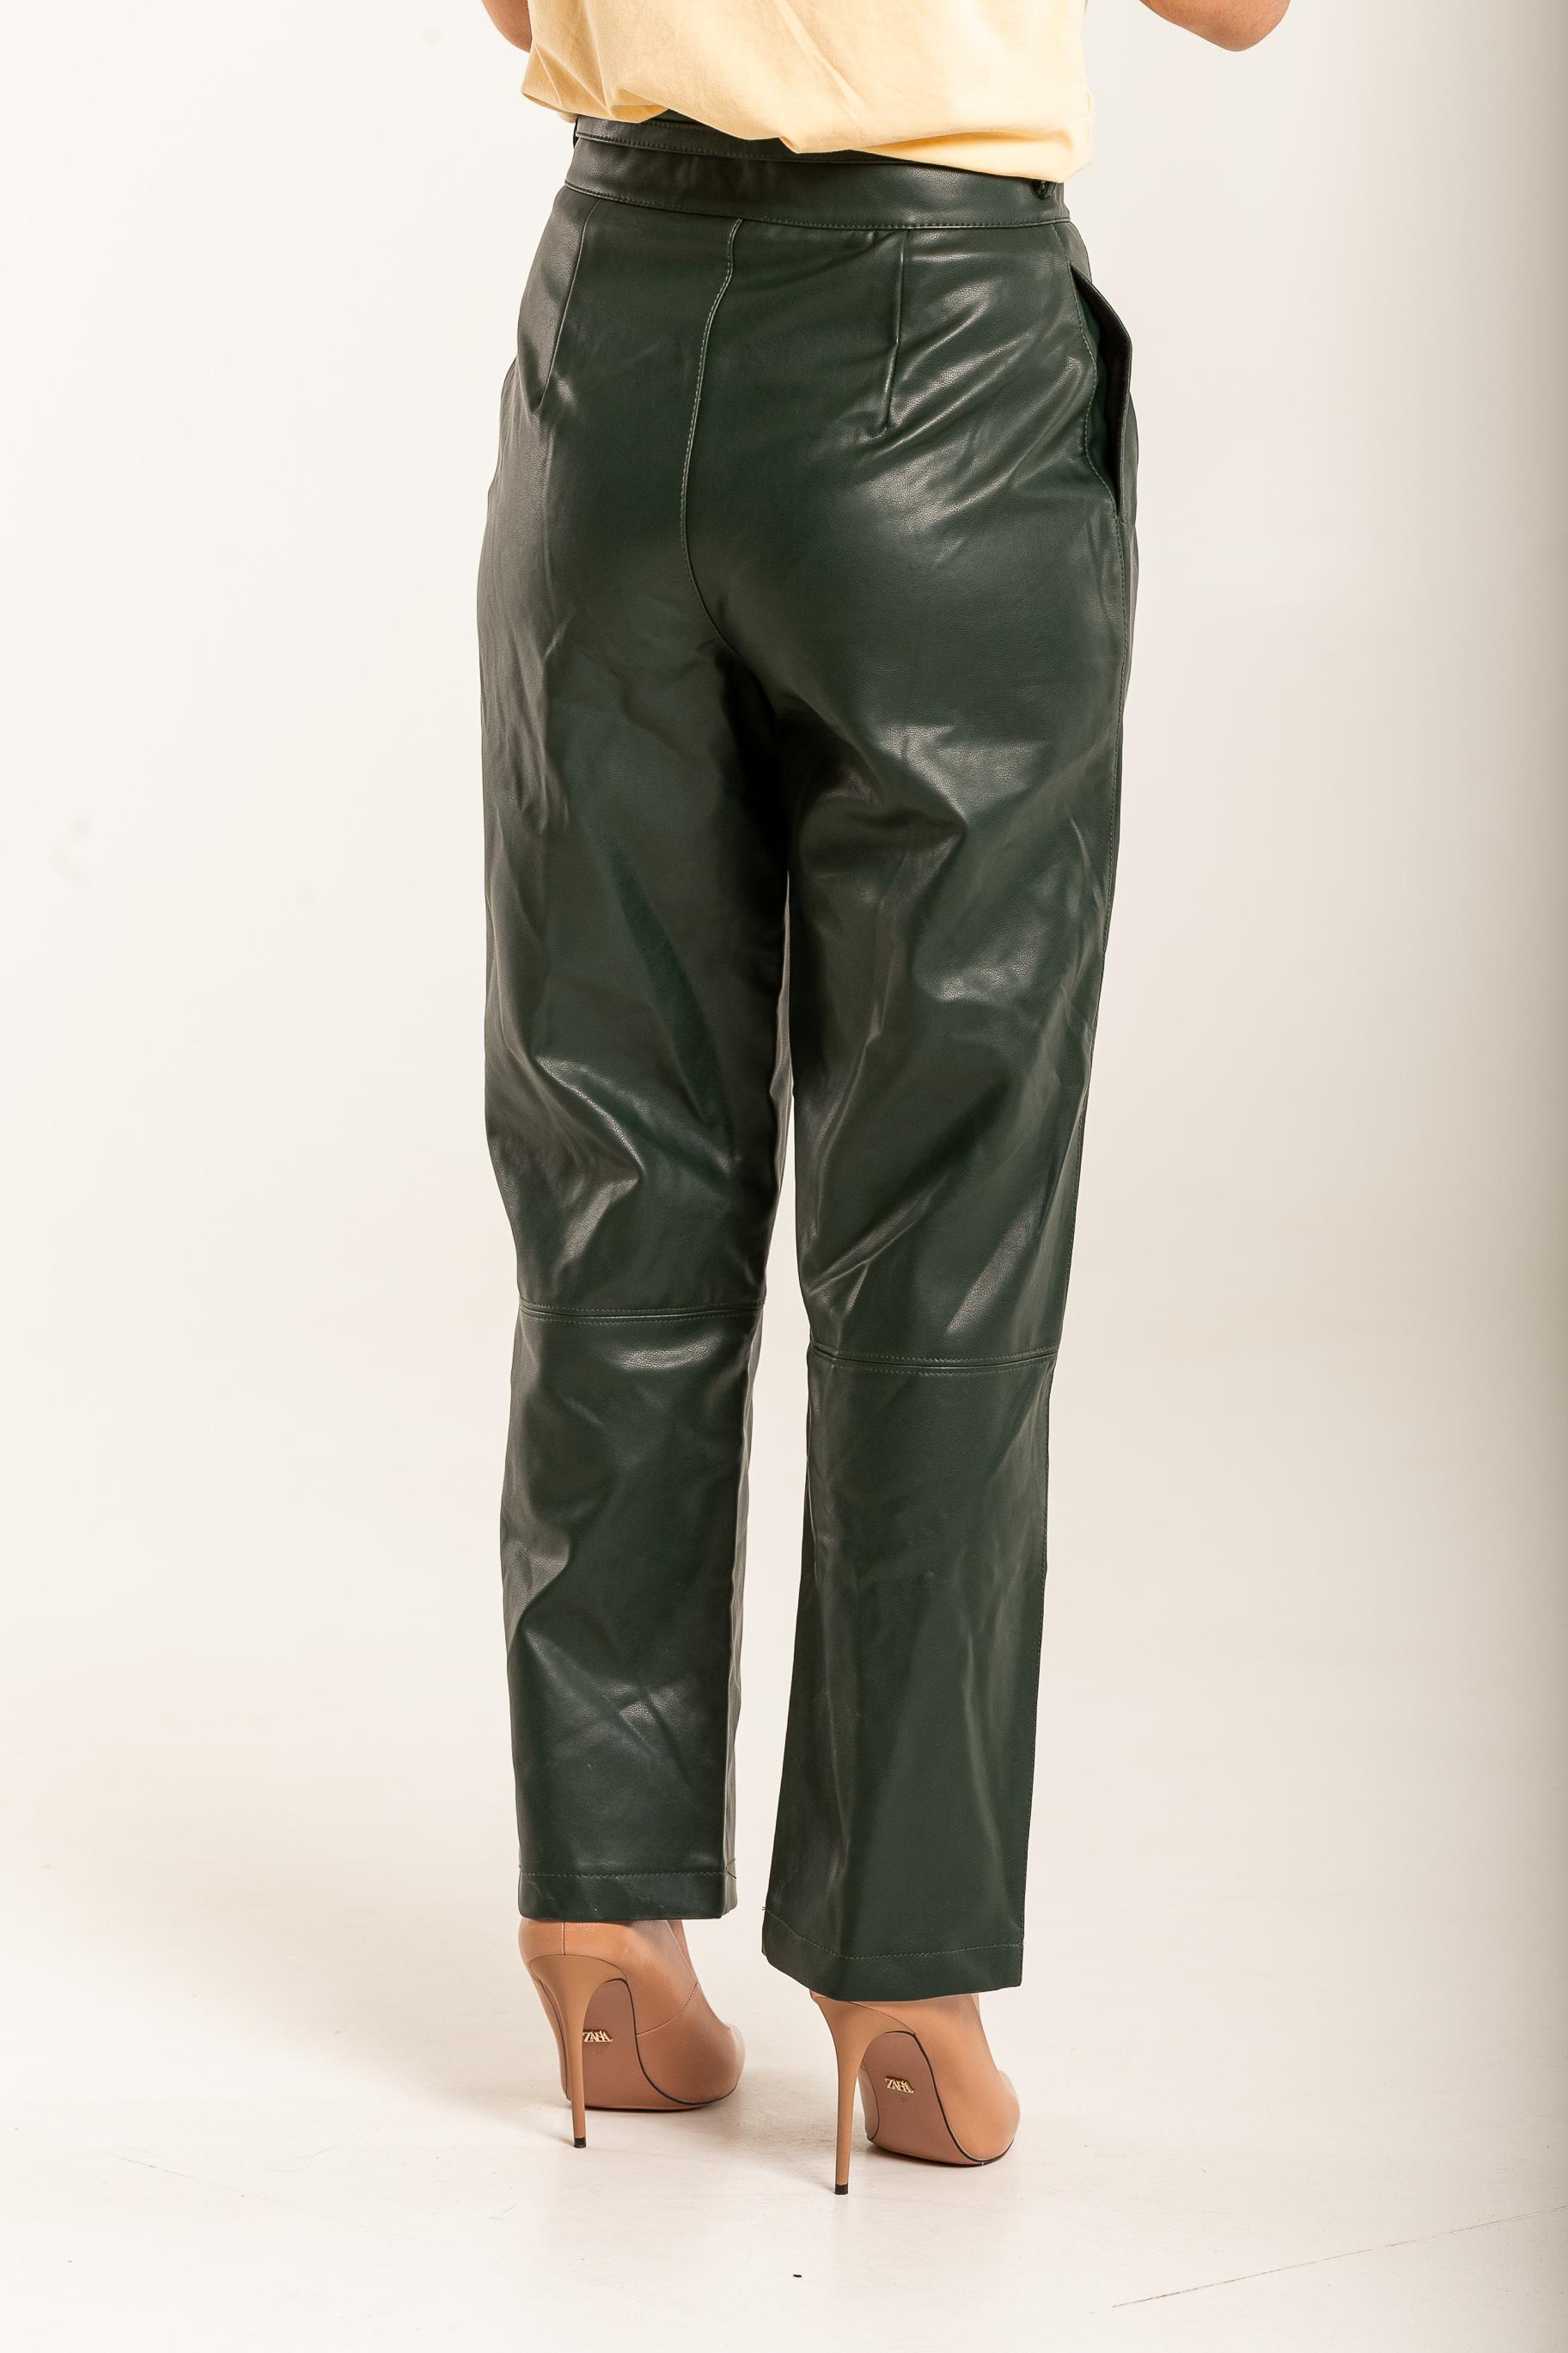 Pantaloni ONLY Casual (3369) photo 0